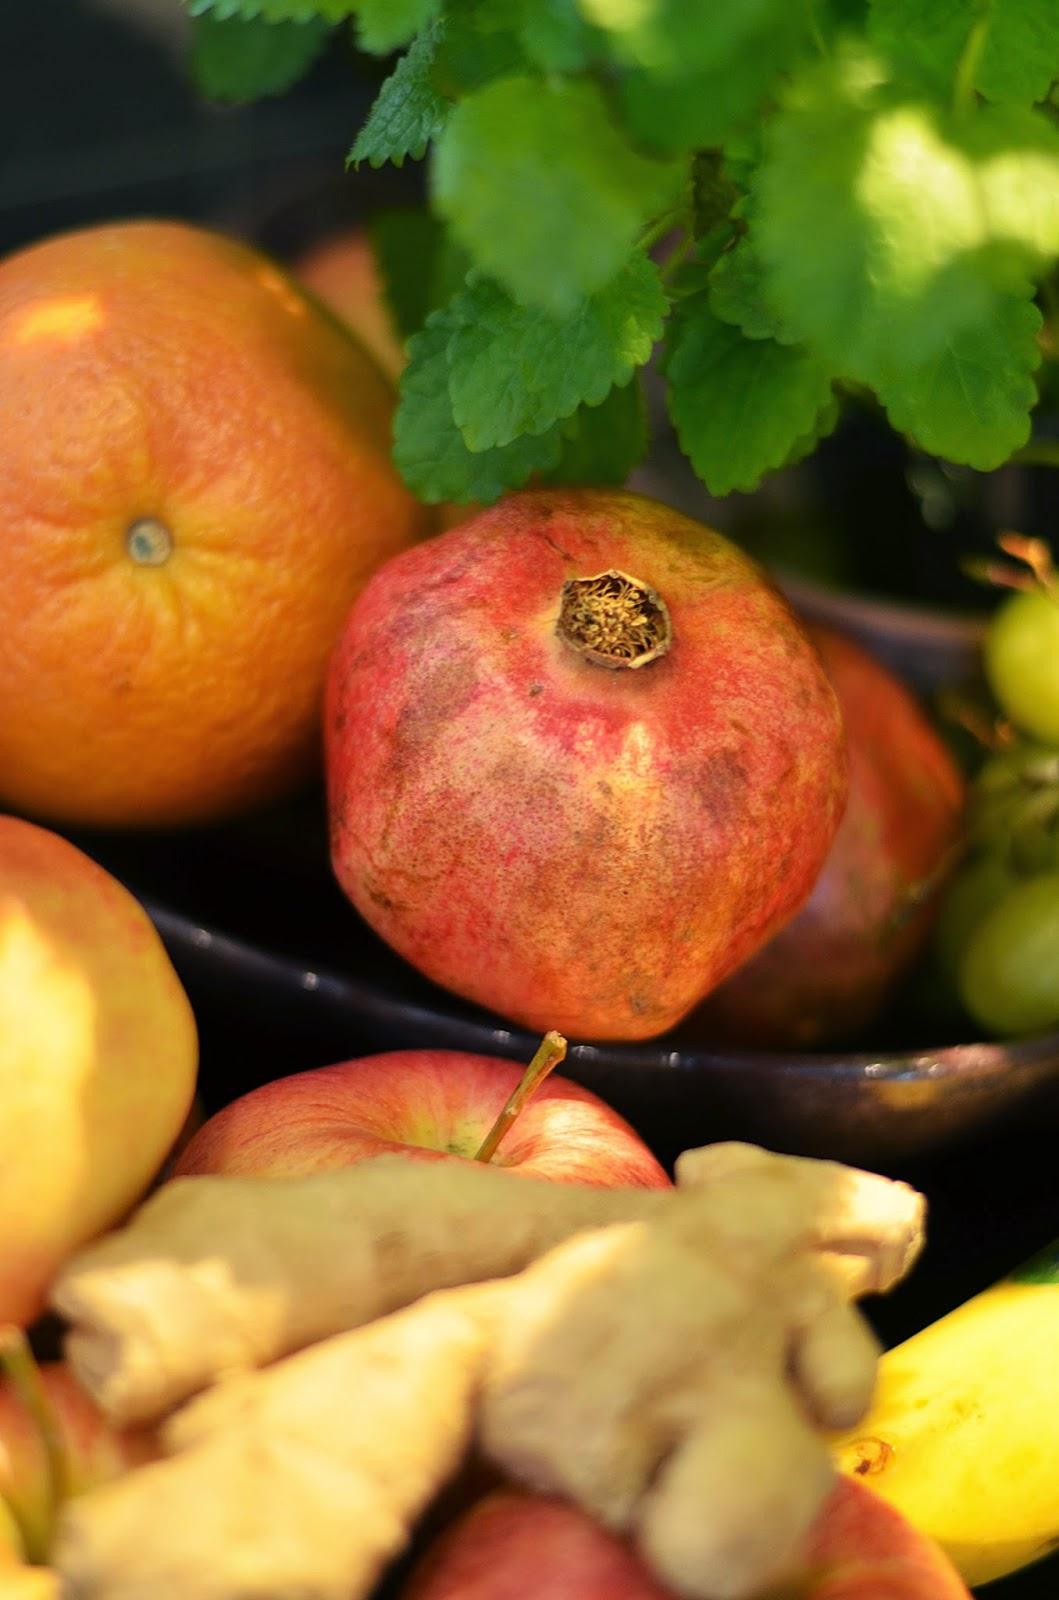 äpple, apelsin, granatäpple, ingefära, närbild, citronmeliss, fresh fruit, blodapelsin, orange, close up, closeup